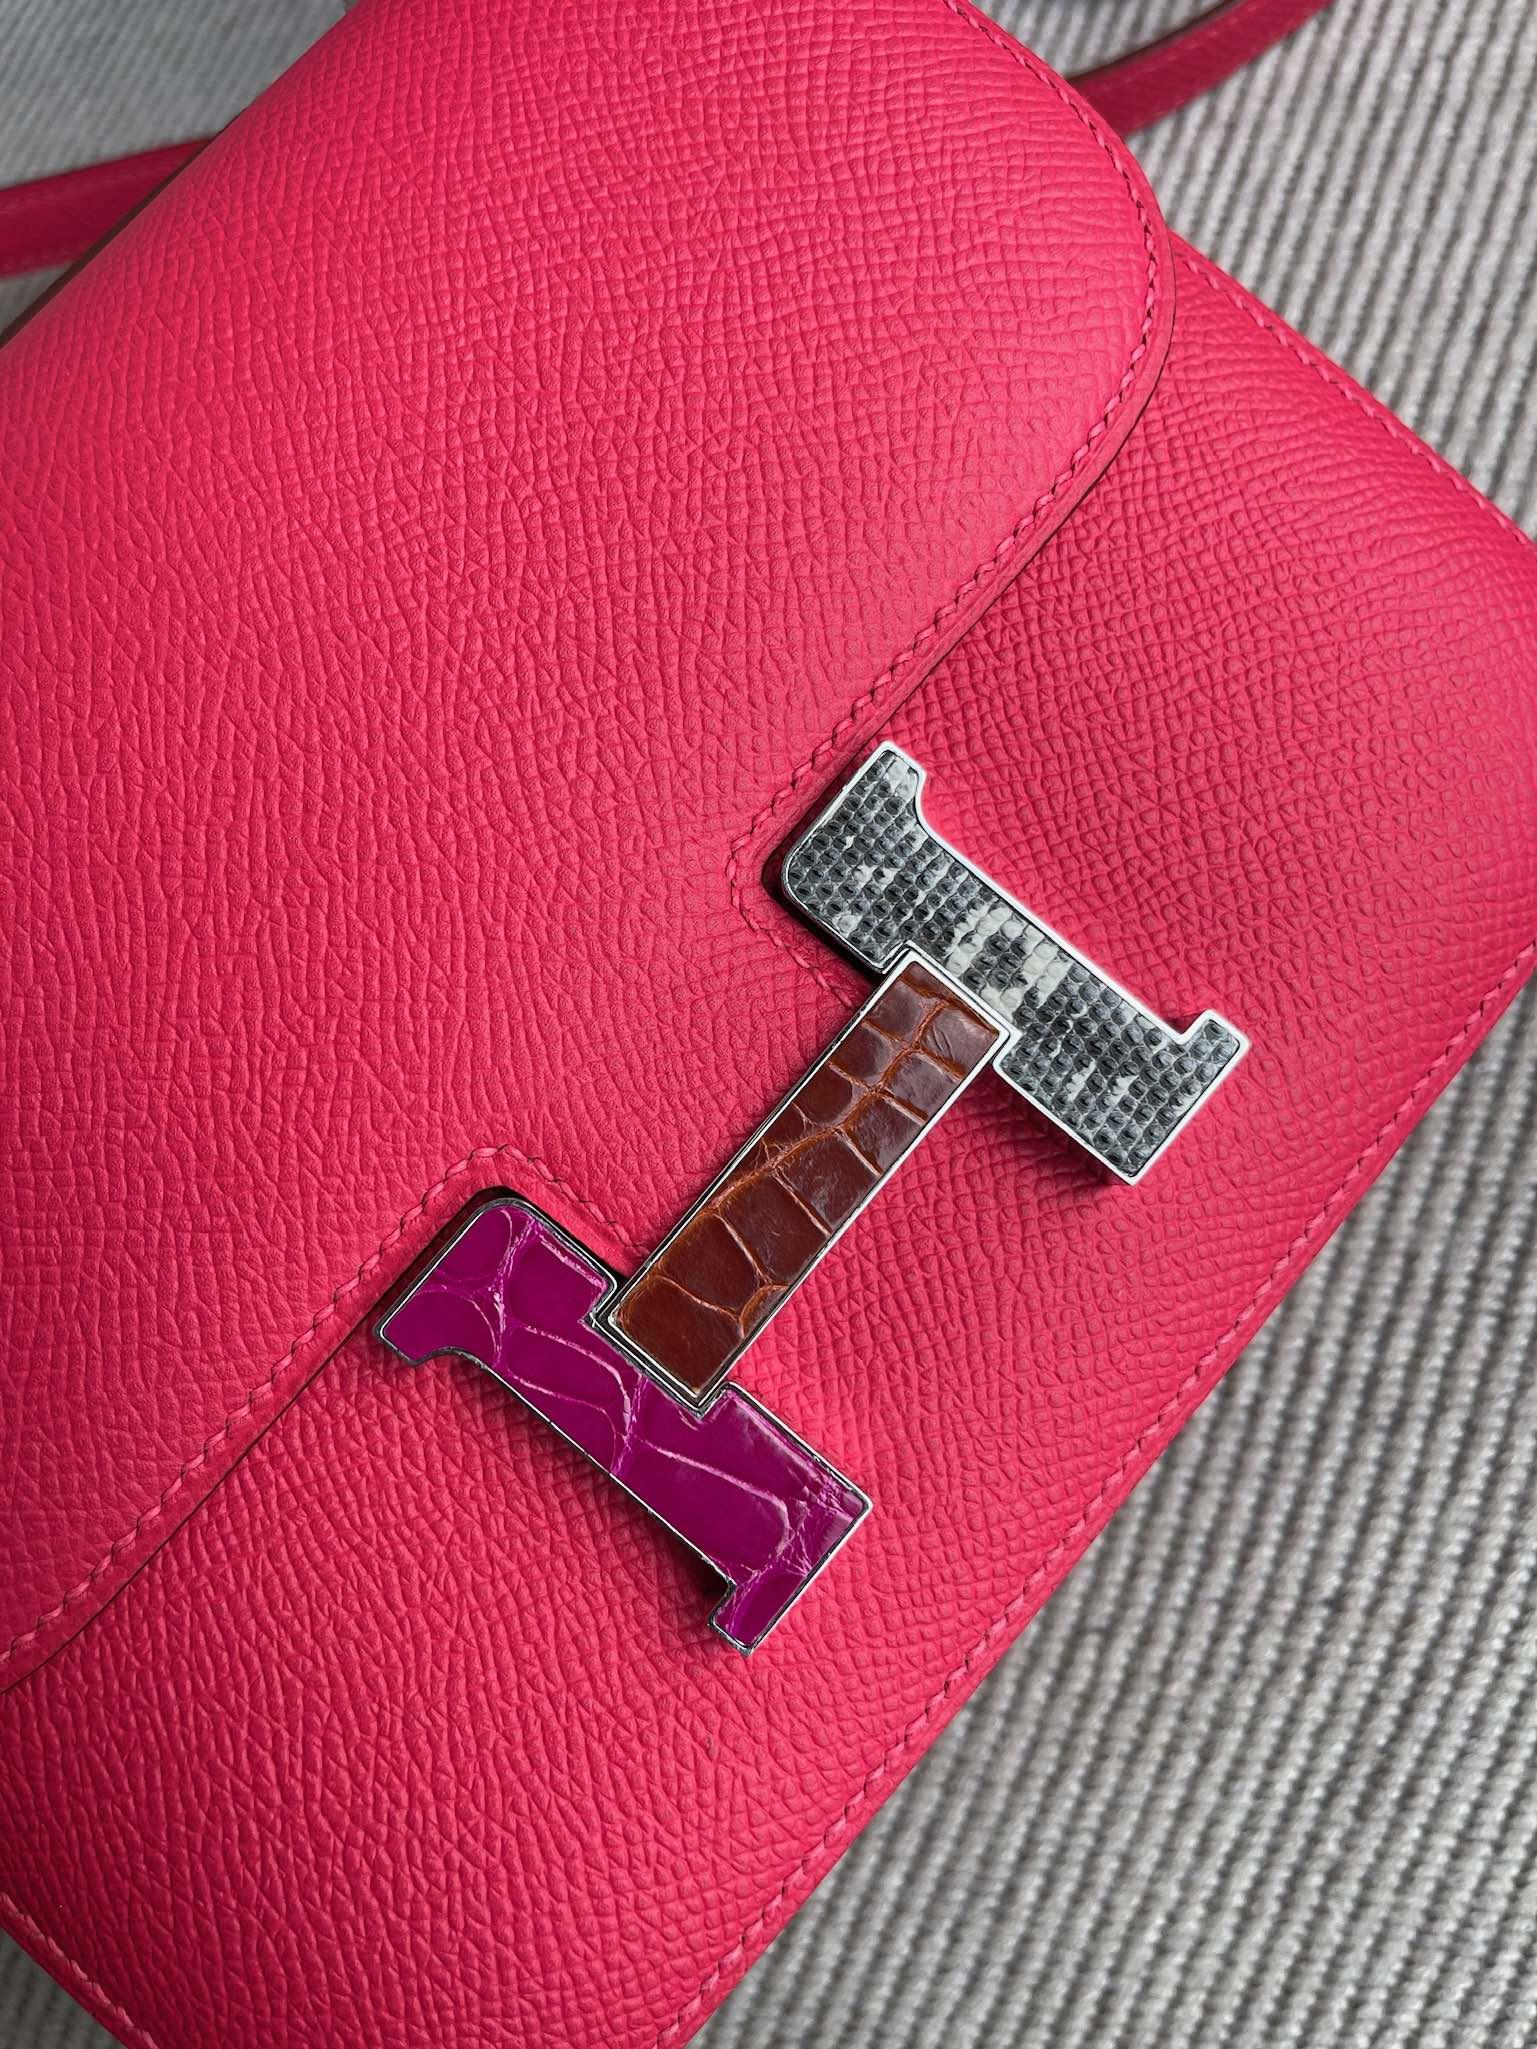 Hermès(爱马仕)Constance 康斯坦斯 Epsom 原厂掌纹皮 I6 极致粉 鳄鱼蜥蜴扣 18cm 顶级手缝 定制